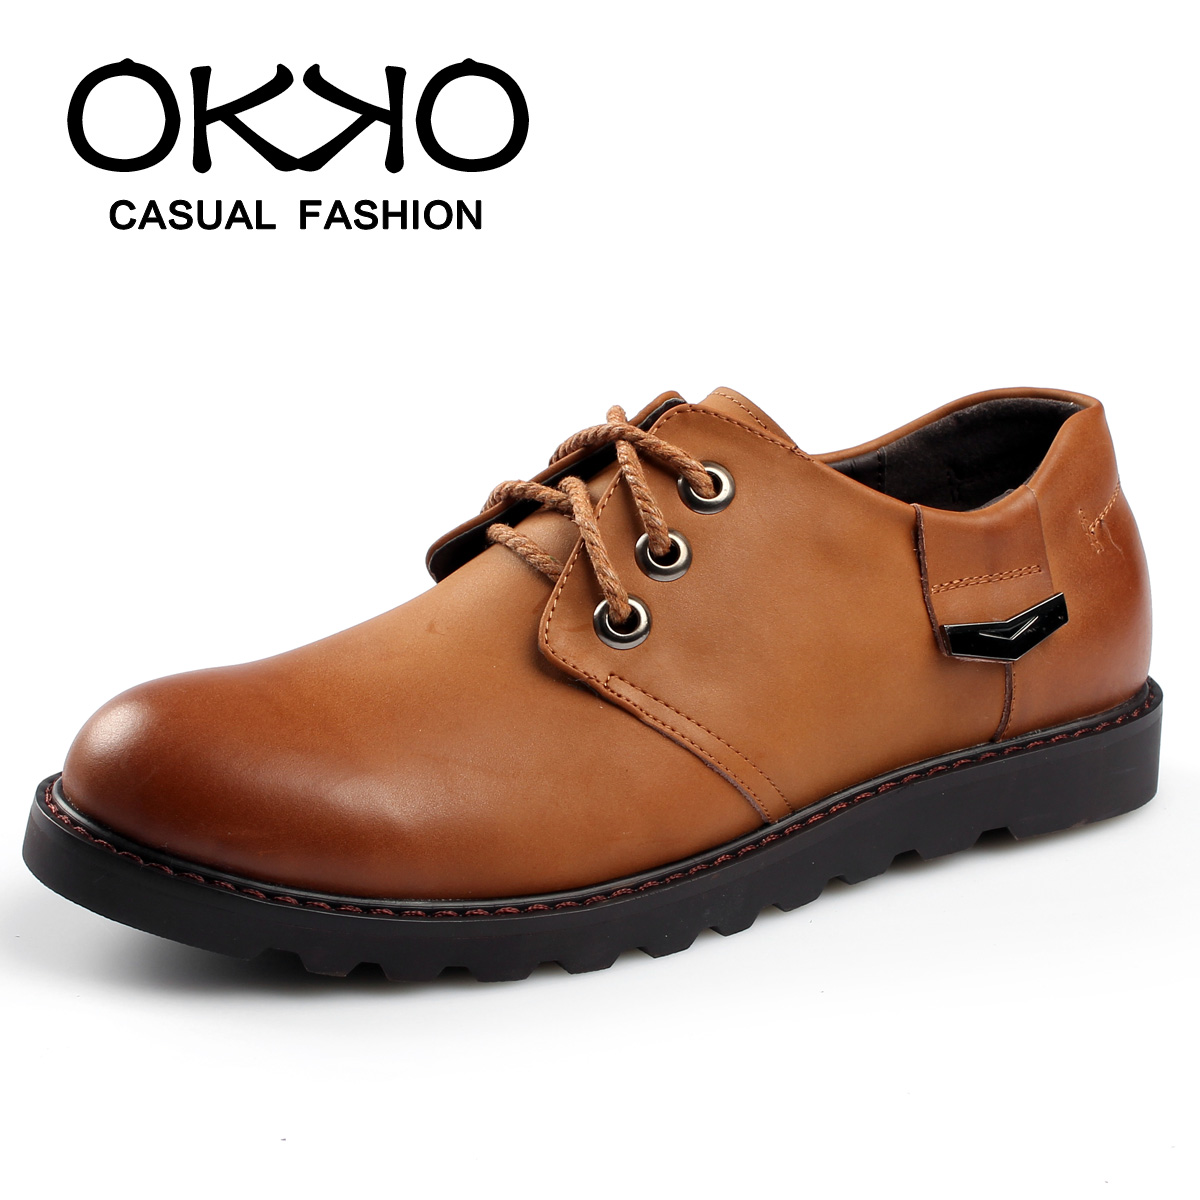 Демисезонные ботинки Okko 1002